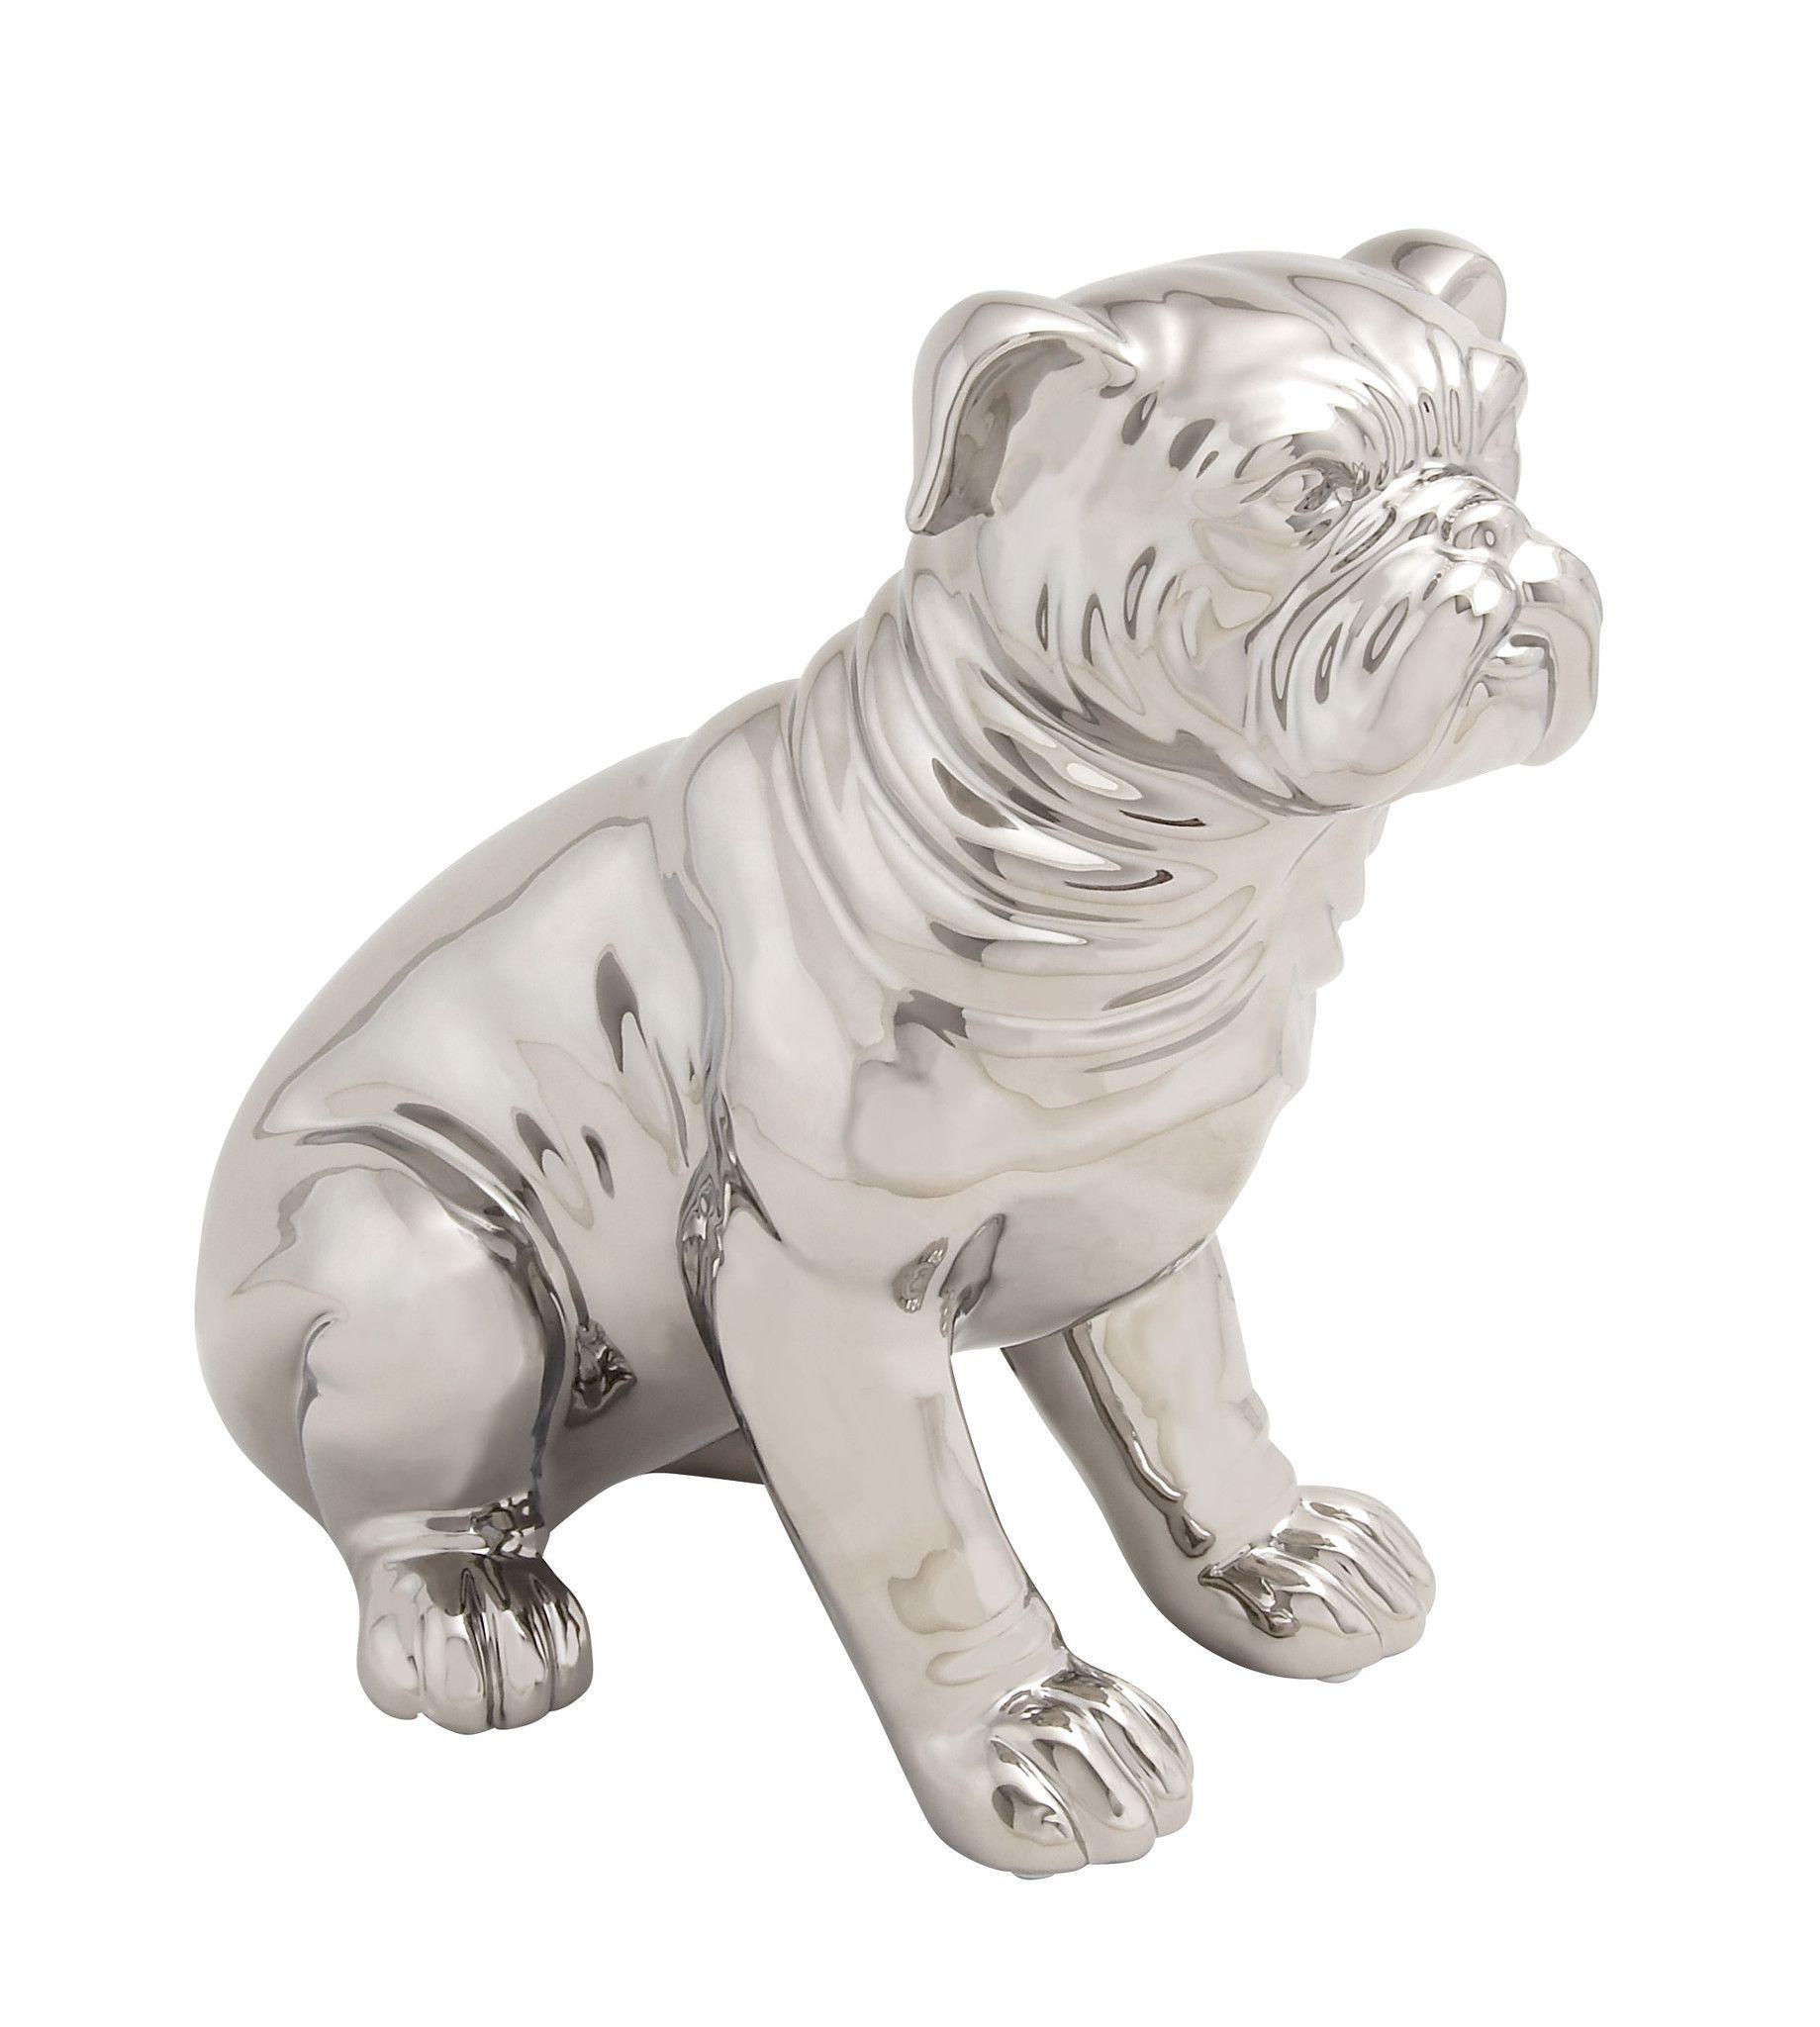 Lovable Ceramic Dog Sculpture